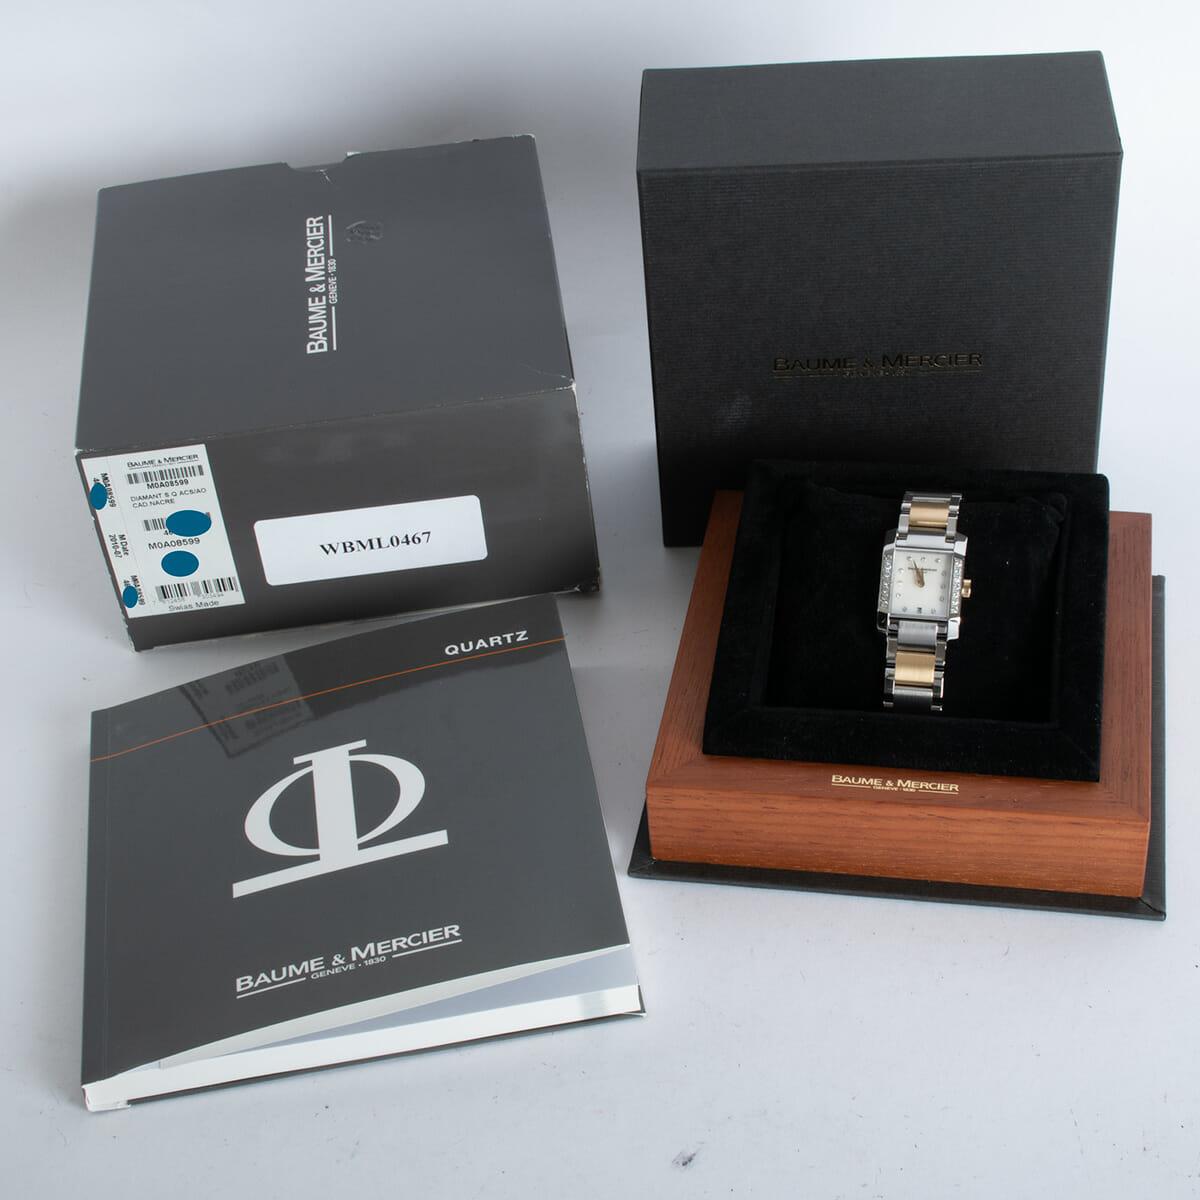 Box / Paper shot of Diamant